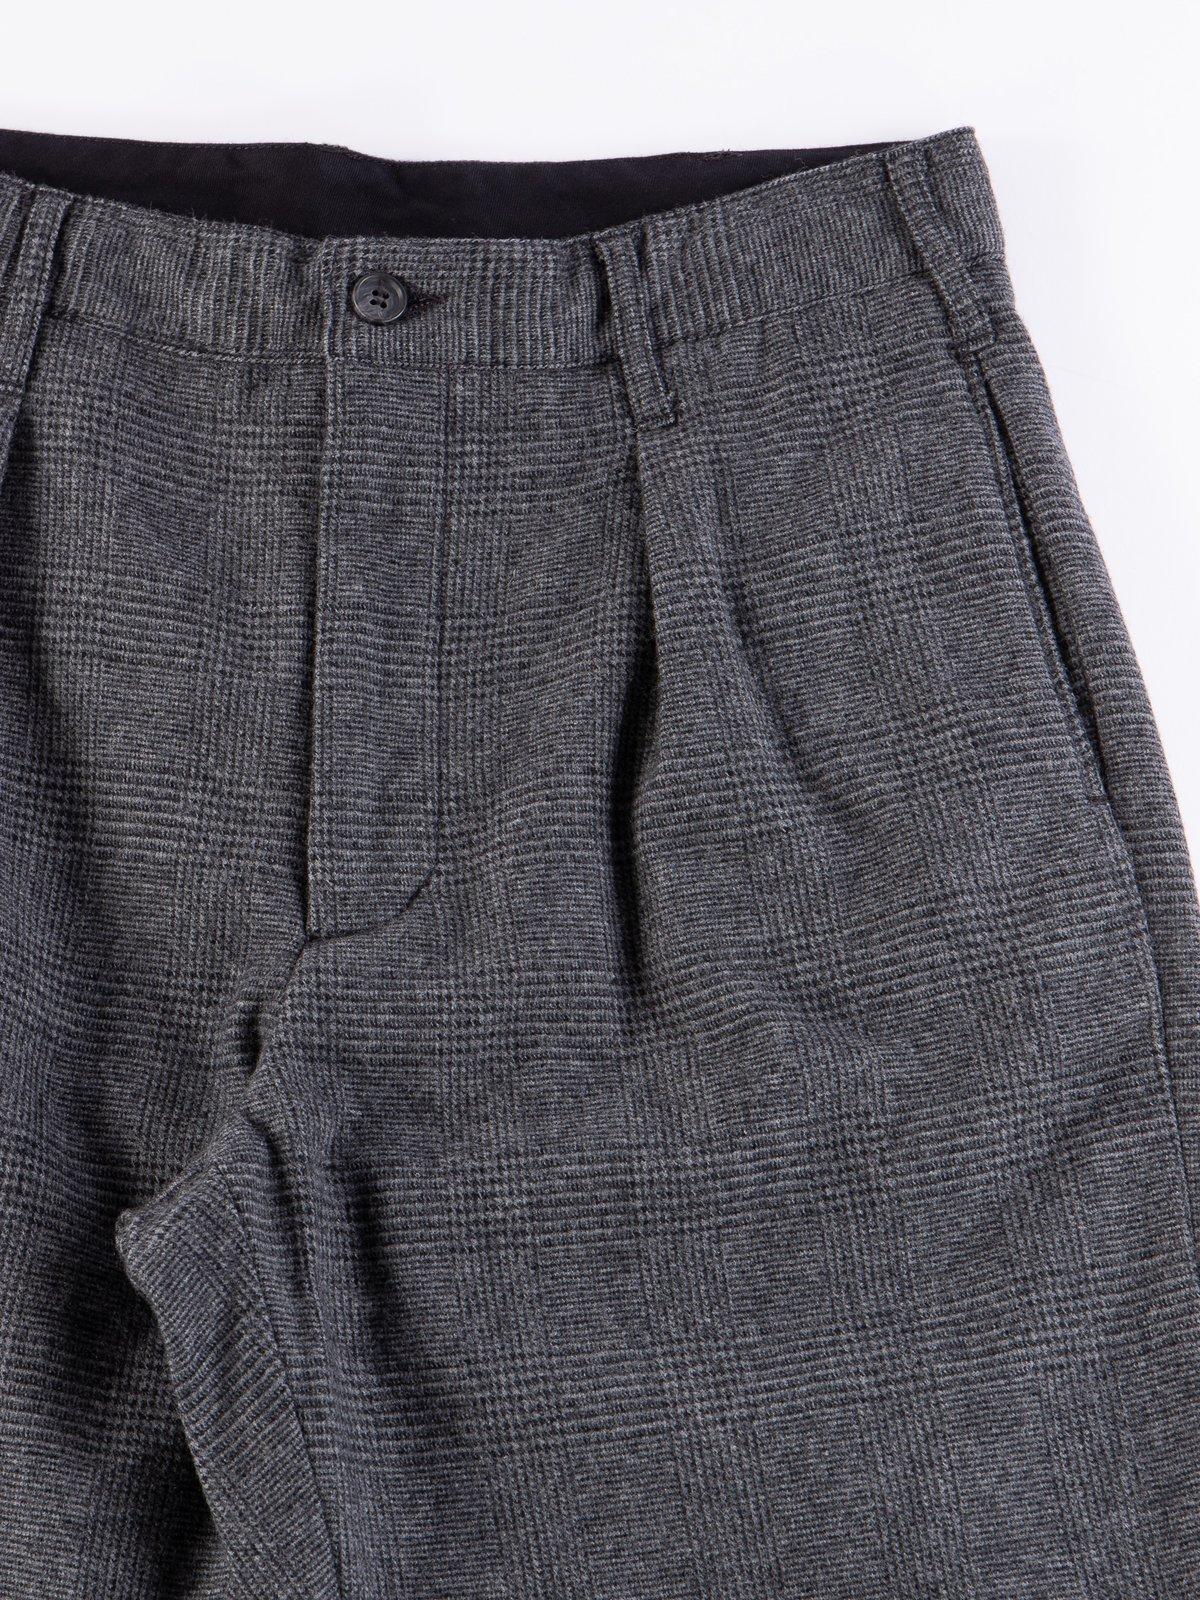 Grey Wool Glen Plaid Stripe Carlyle Pant - Image 3